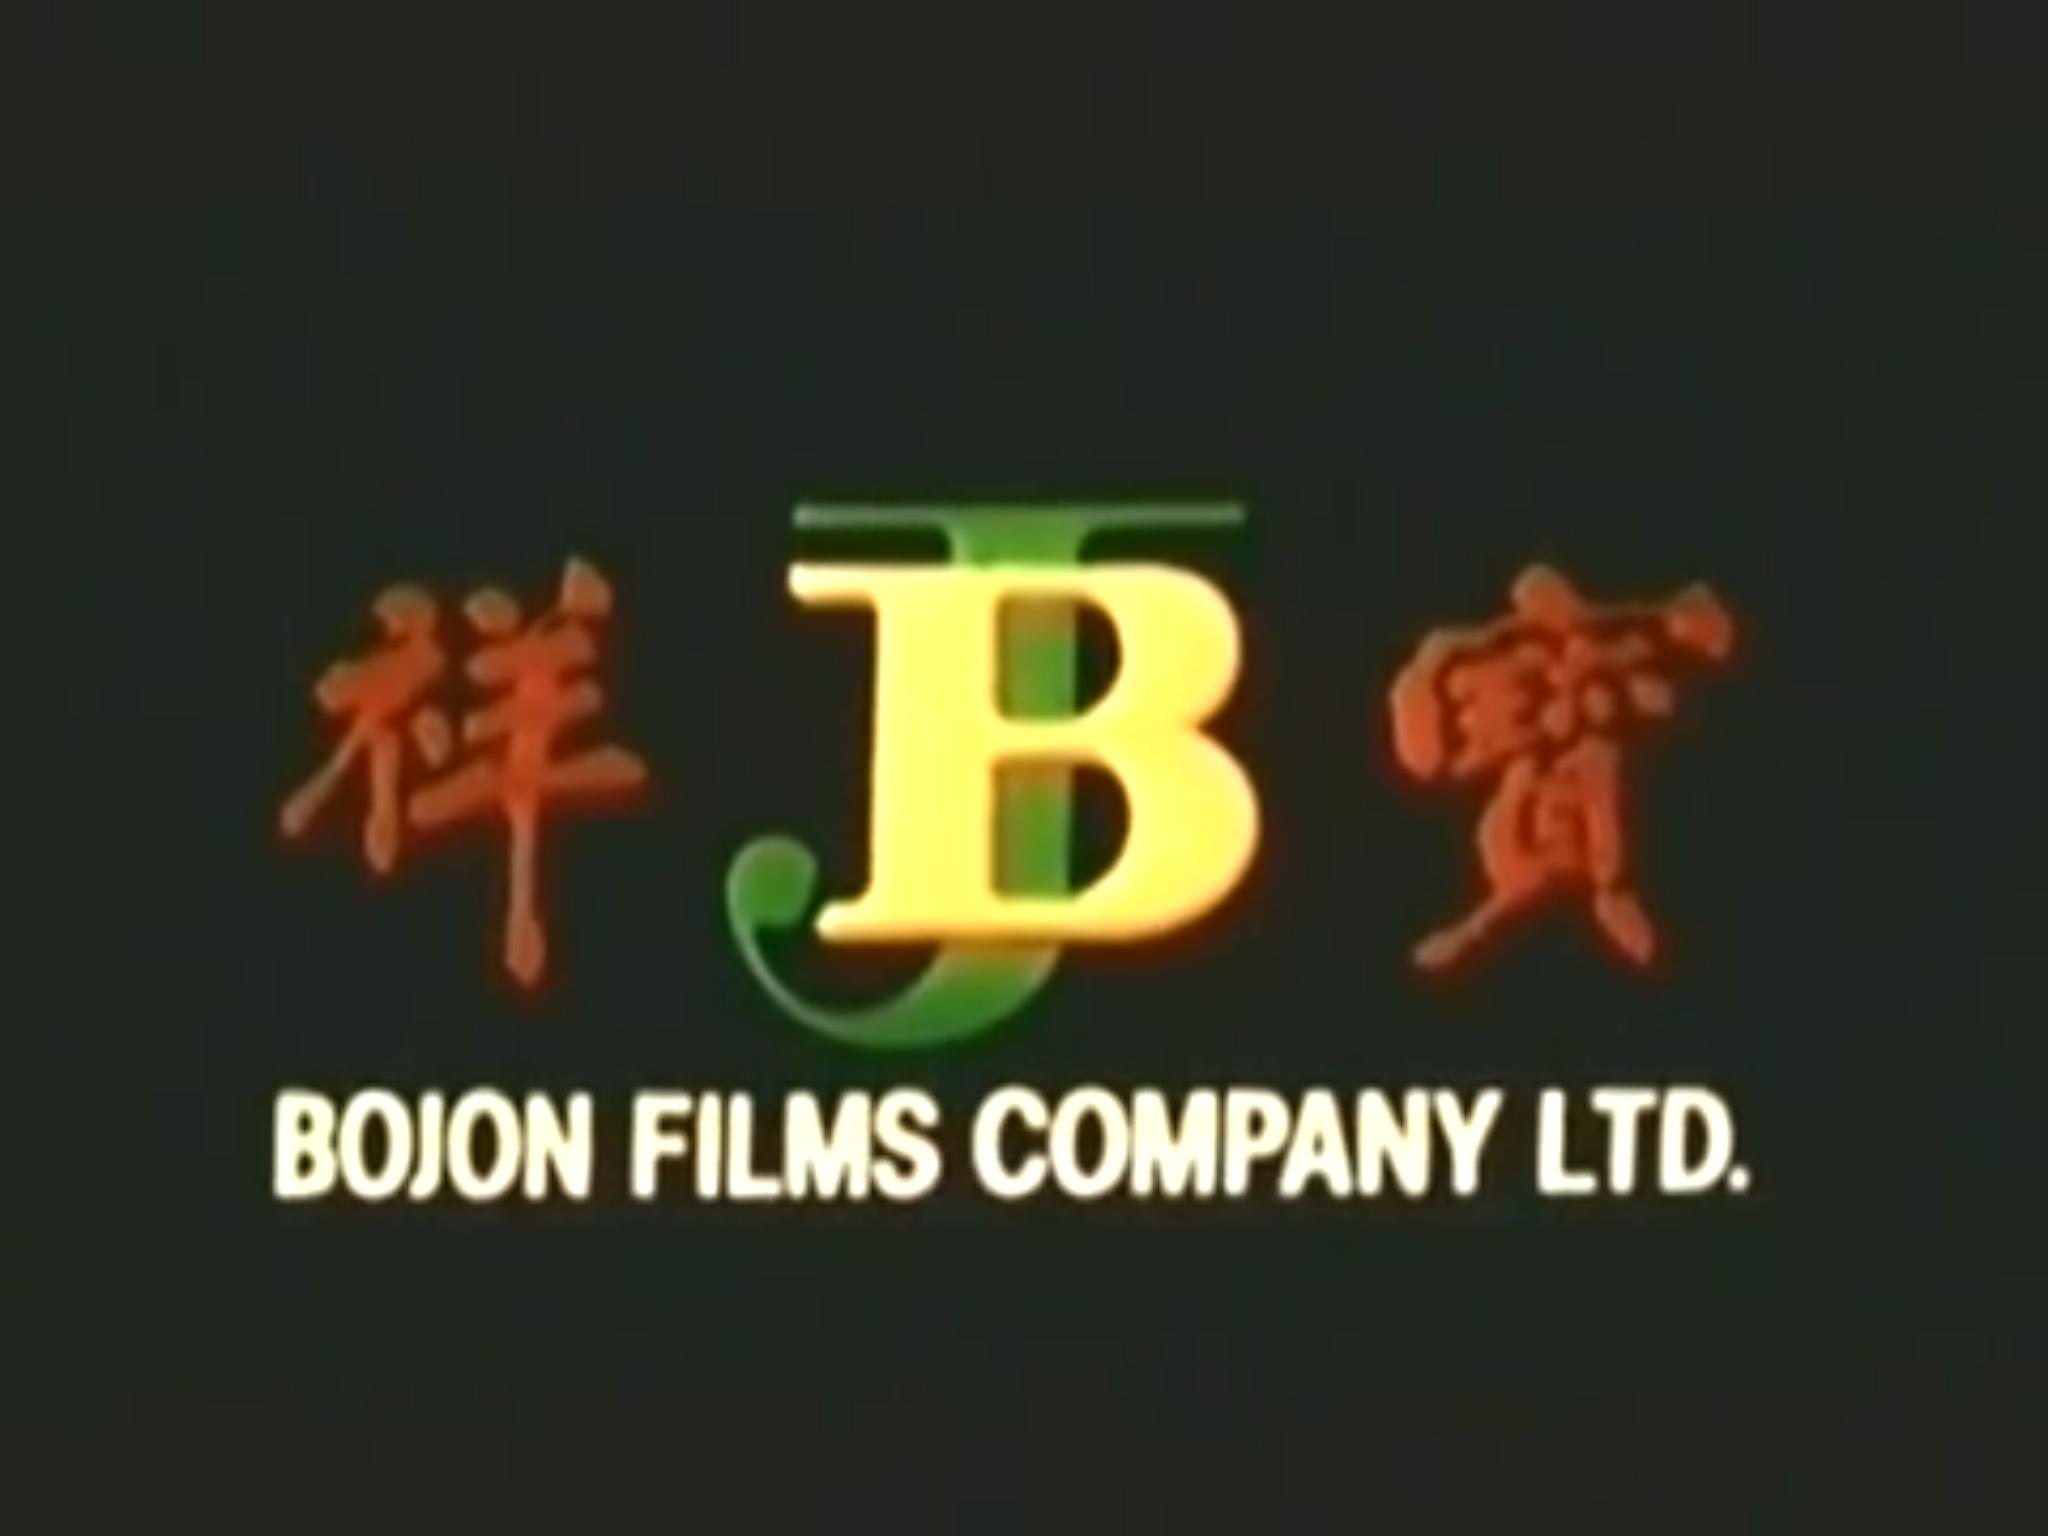 Bojon Films Company Ltd. (Hong Kong)